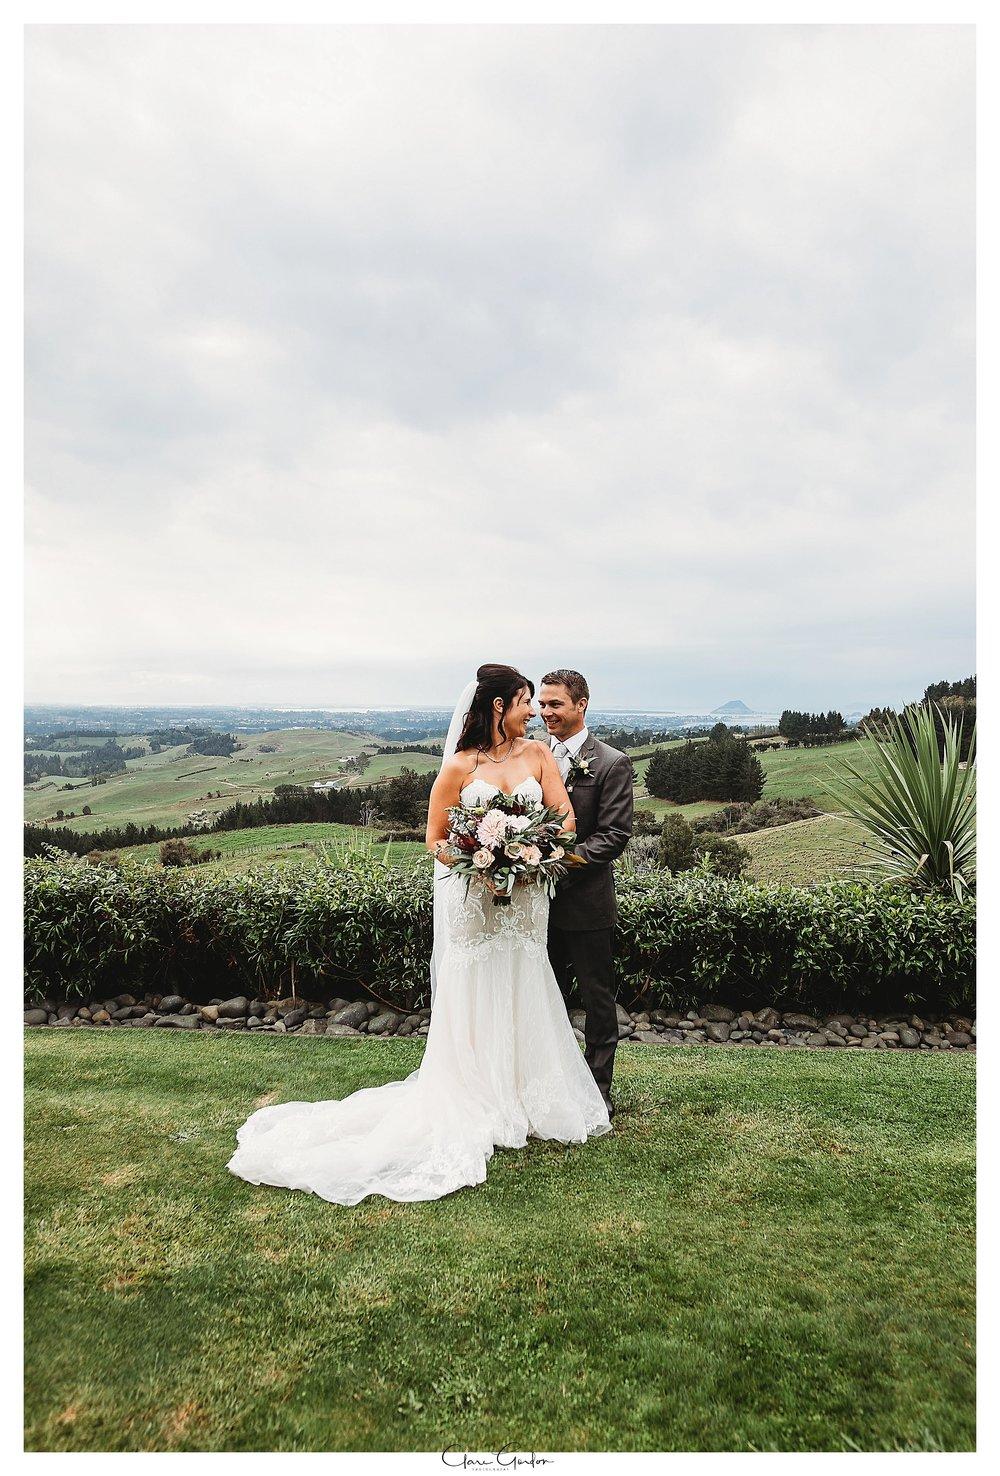 Eagle-ridge-wedding-photo-bride-and-groom